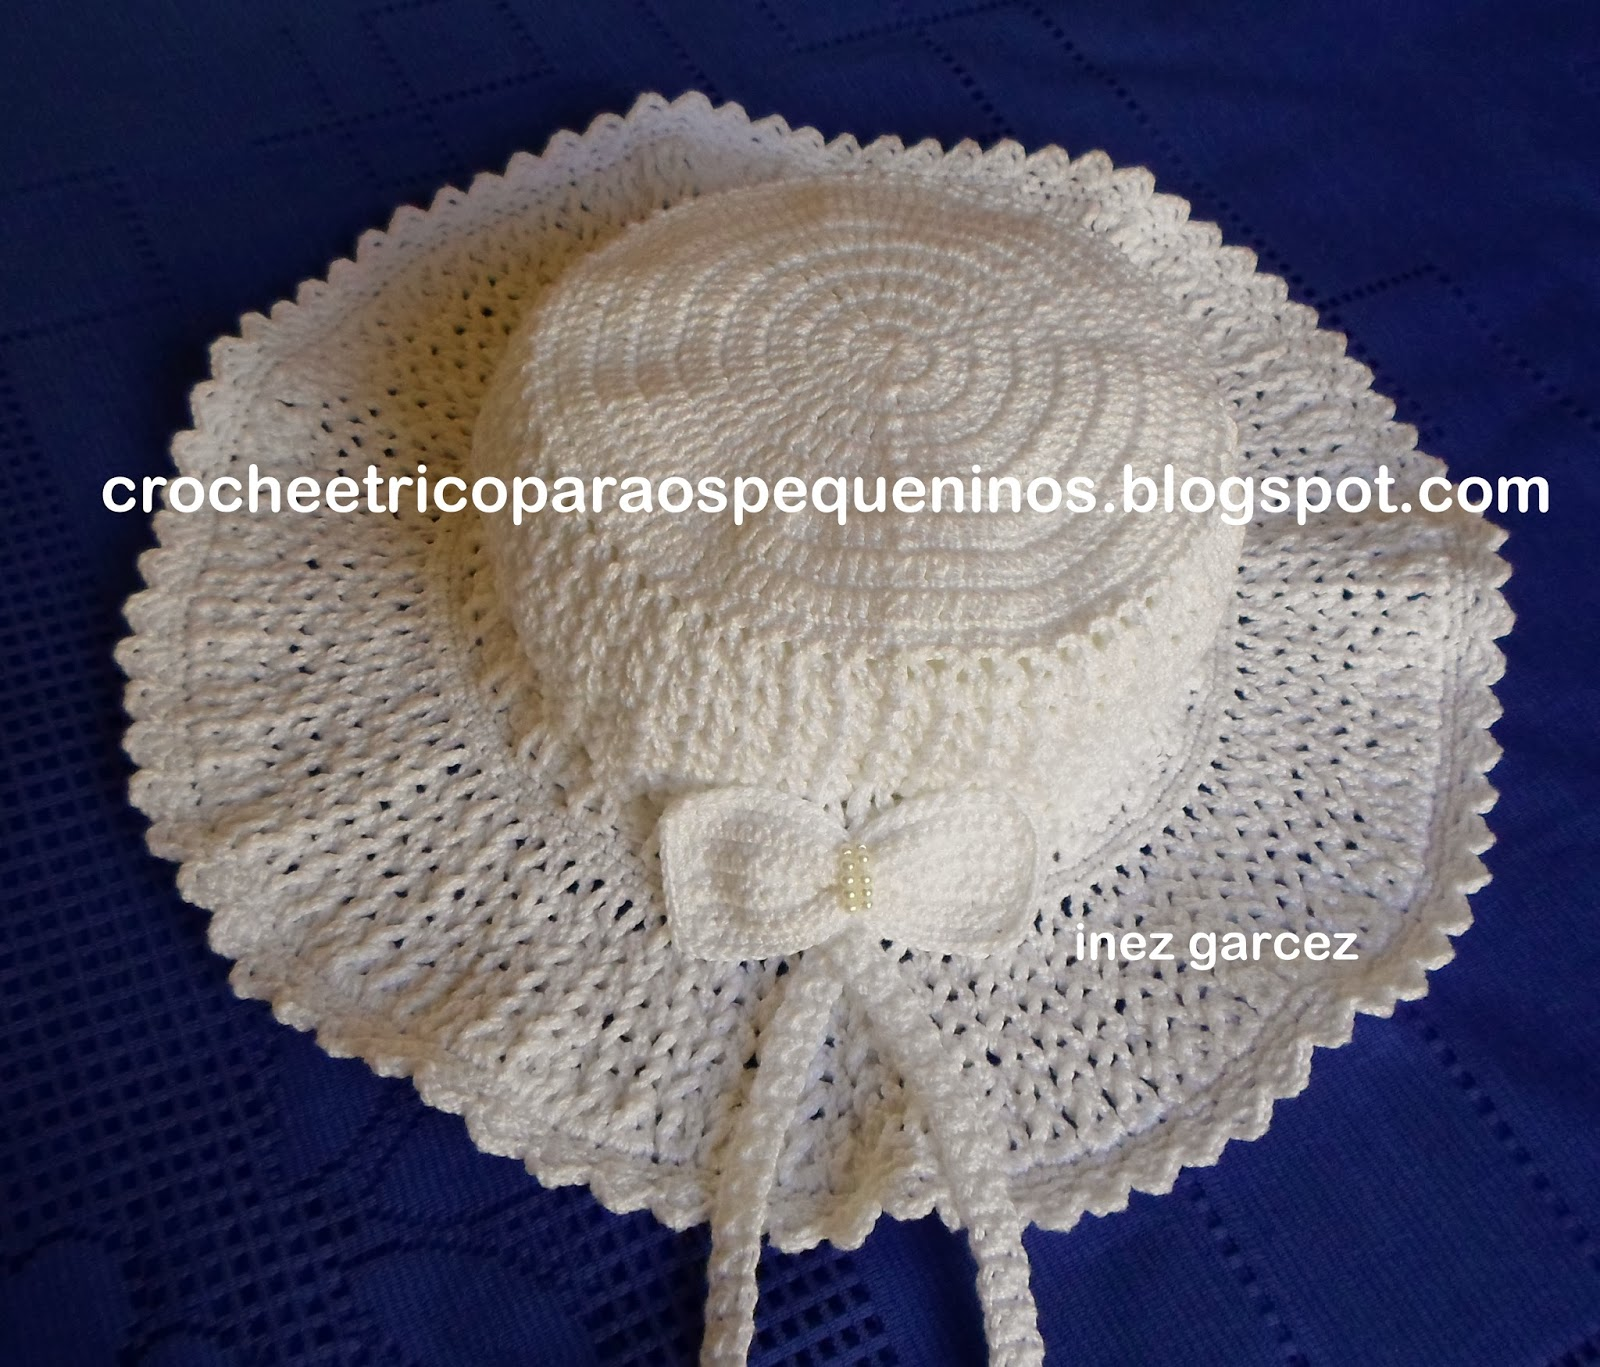 CROCHE E TRICO PARA OS PEQUENINOS  Chapéu de crochê para bebe no ... 7fde85744dd